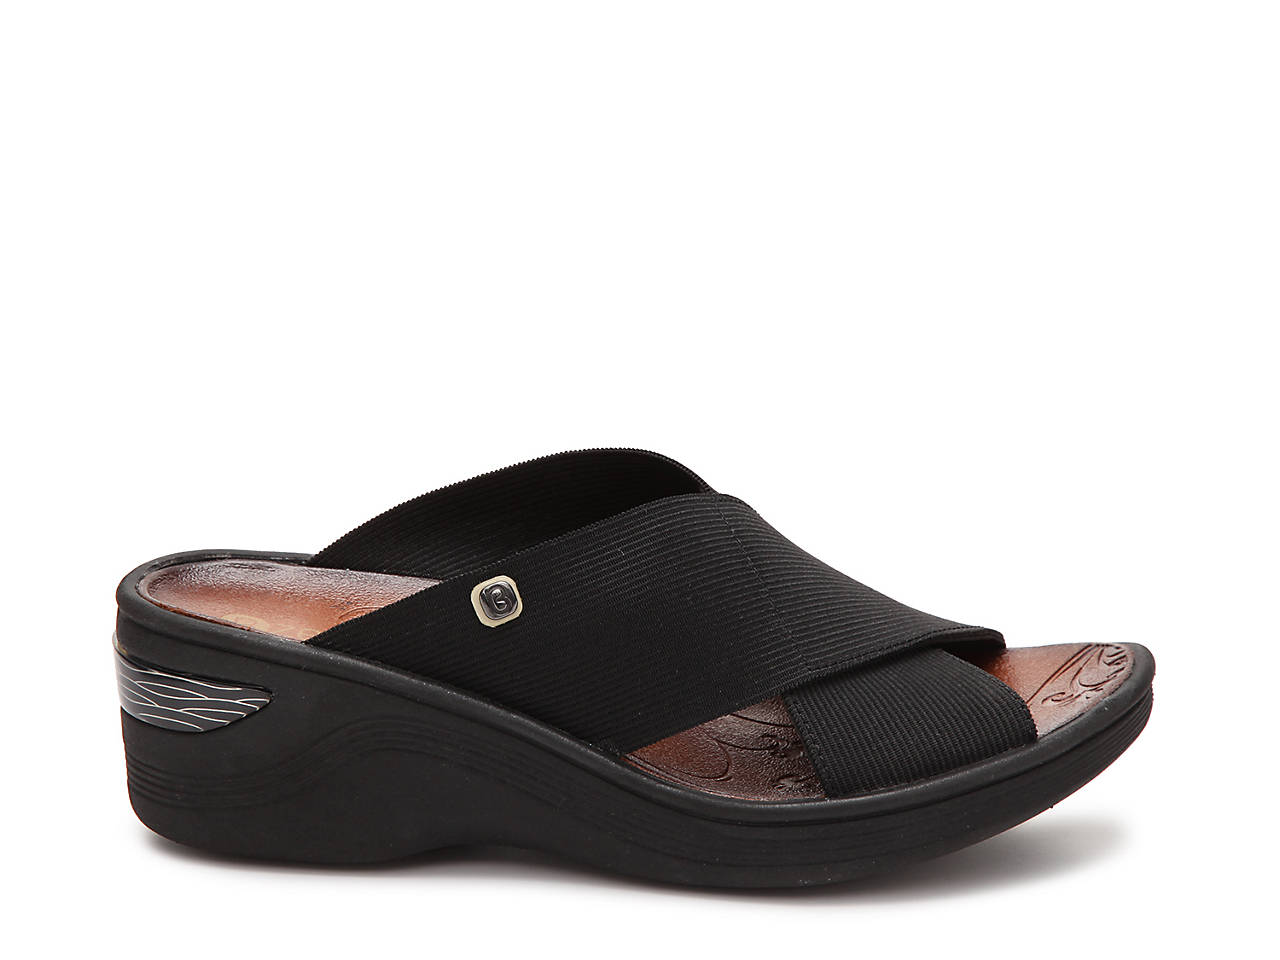 0fcb6e3f00e BZees Desire Wedge Sandal Women s Shoes